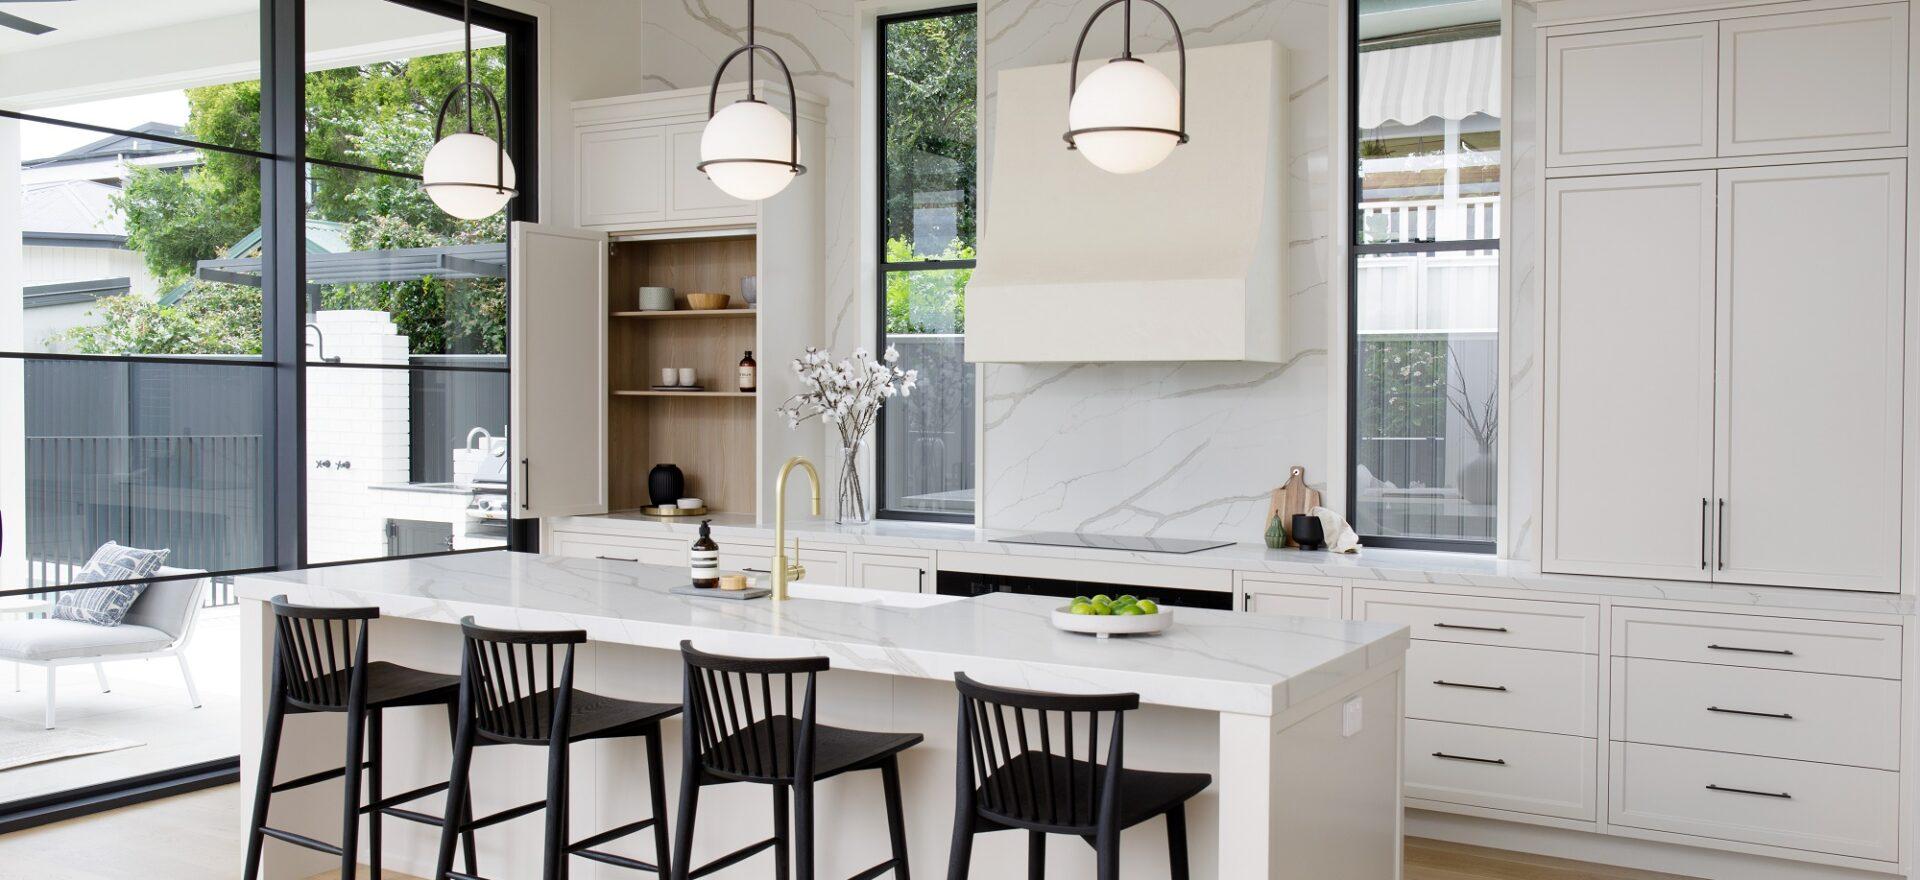 Smartstone kitchen island and splashback